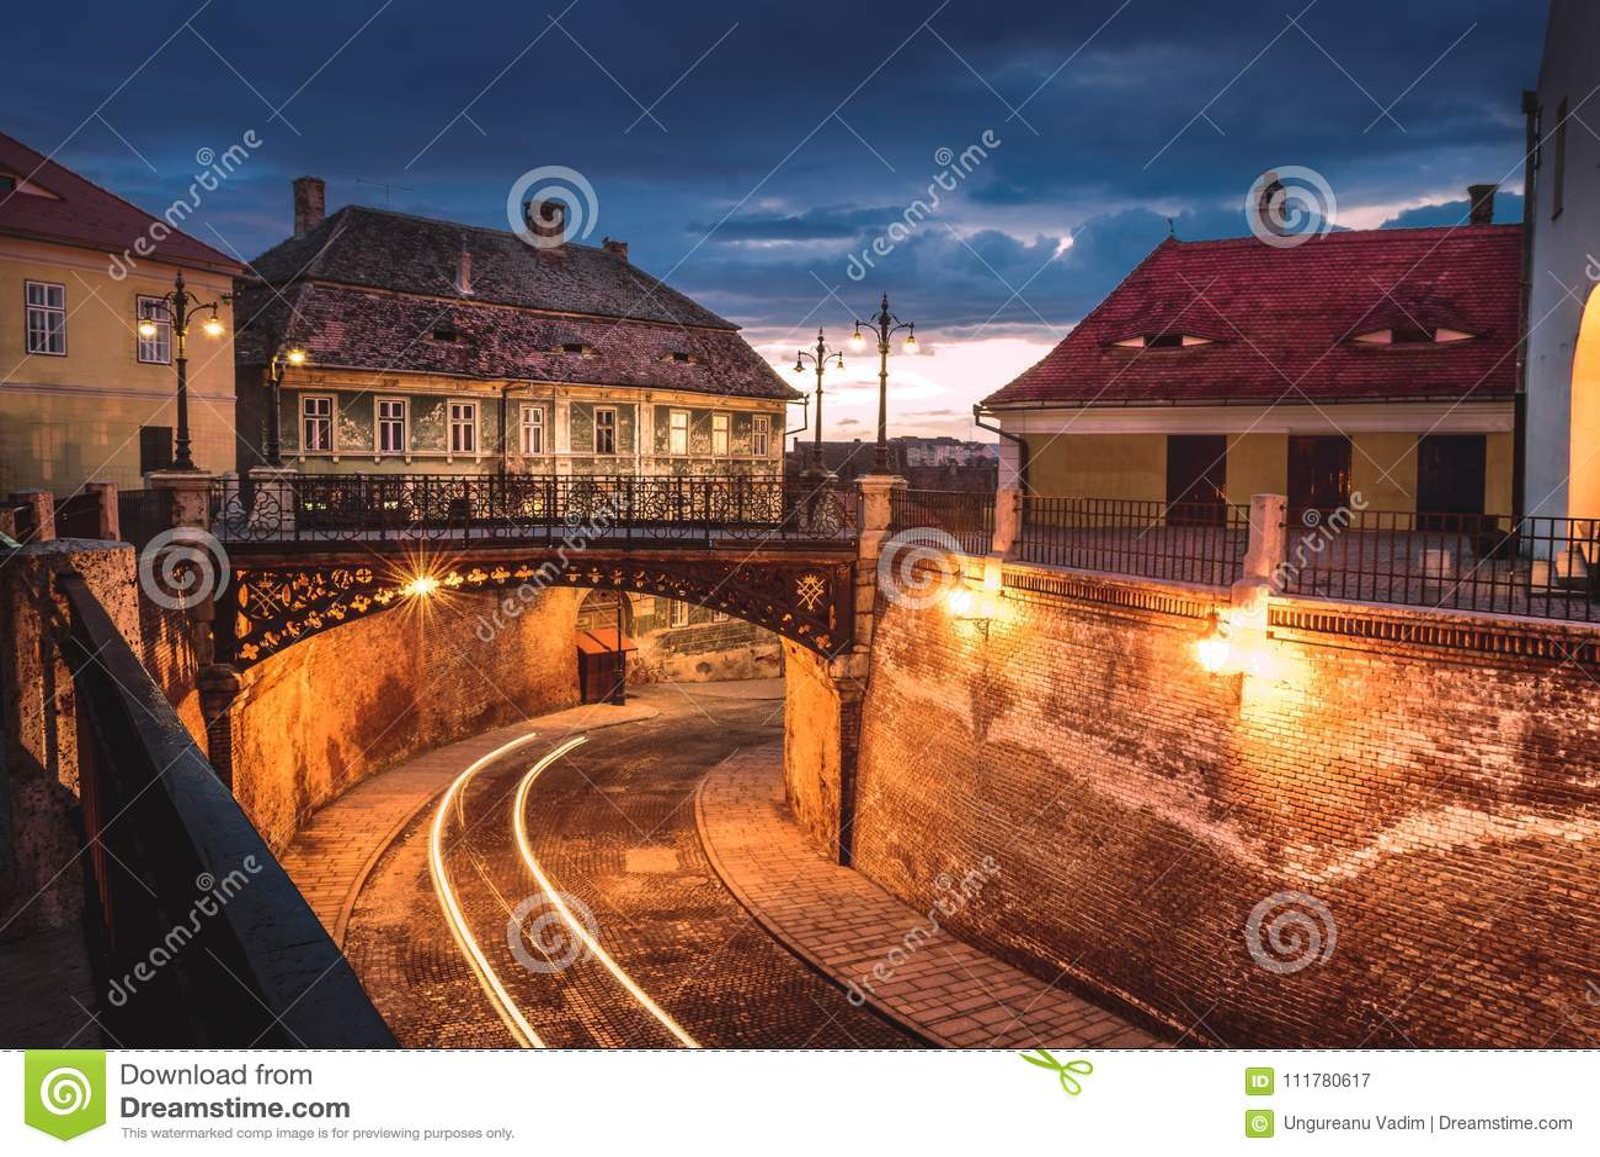 The Bridge of Lies at sunset in Sibiu, Romania